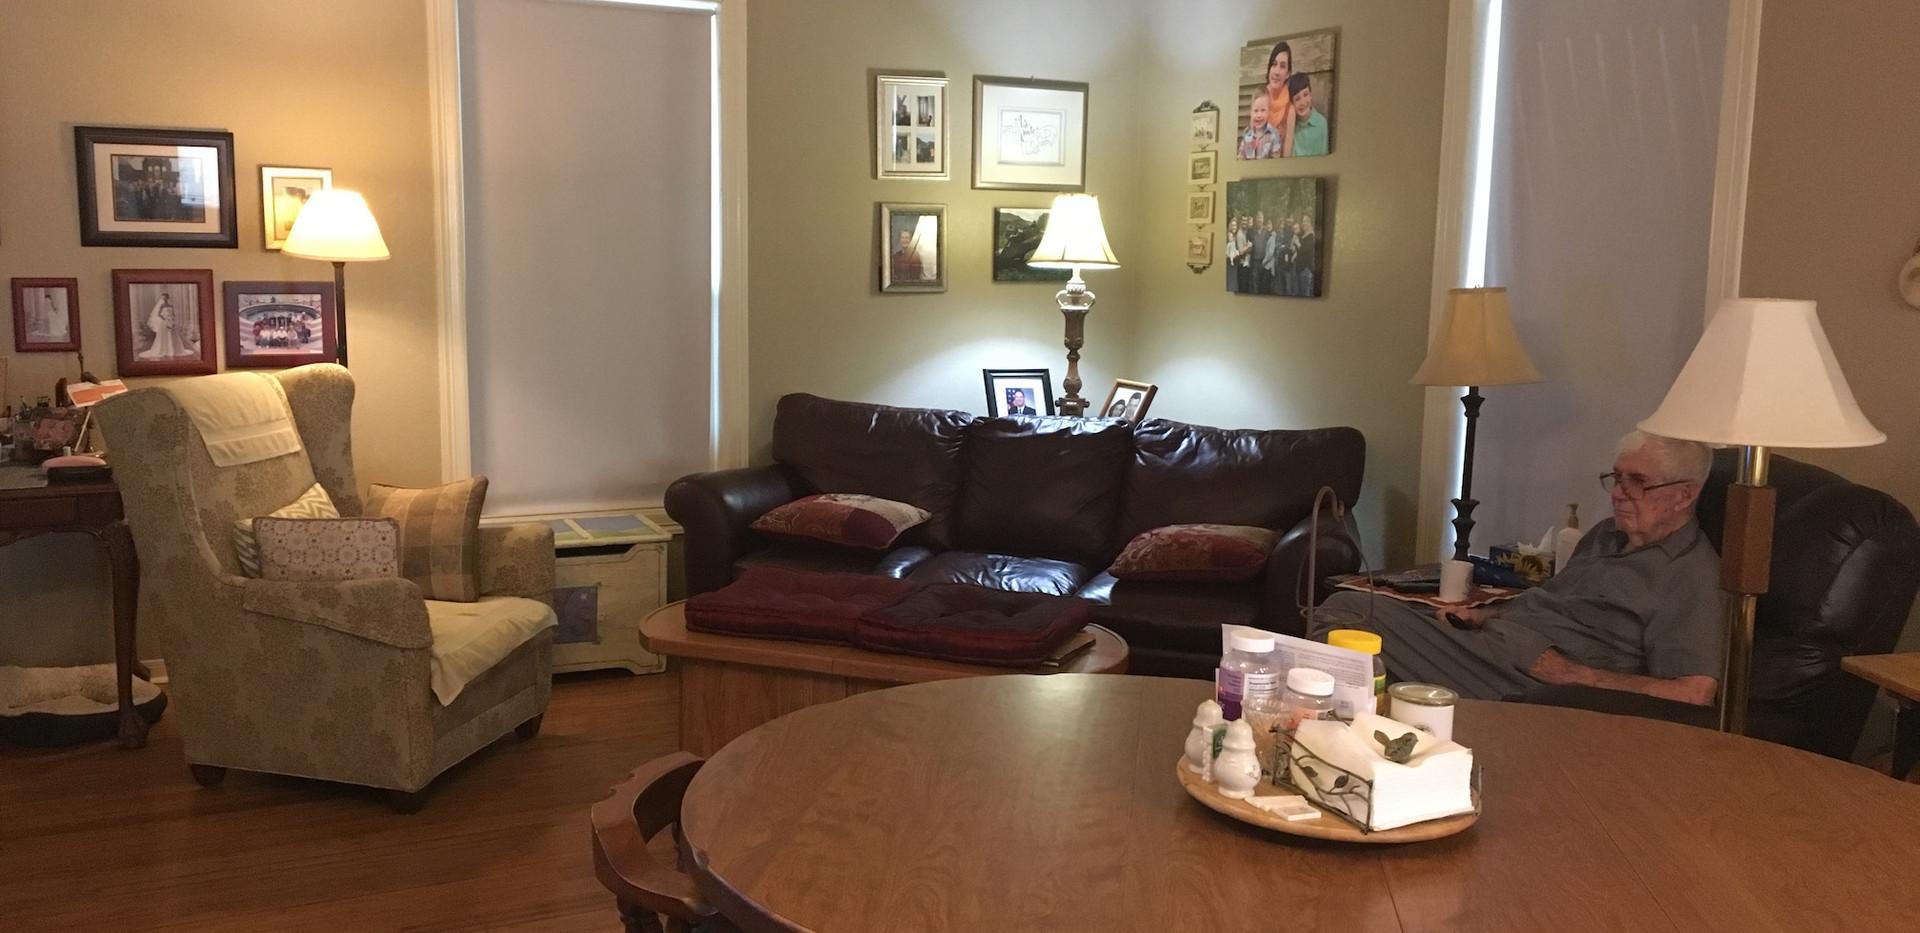 No drapes in rearranged room